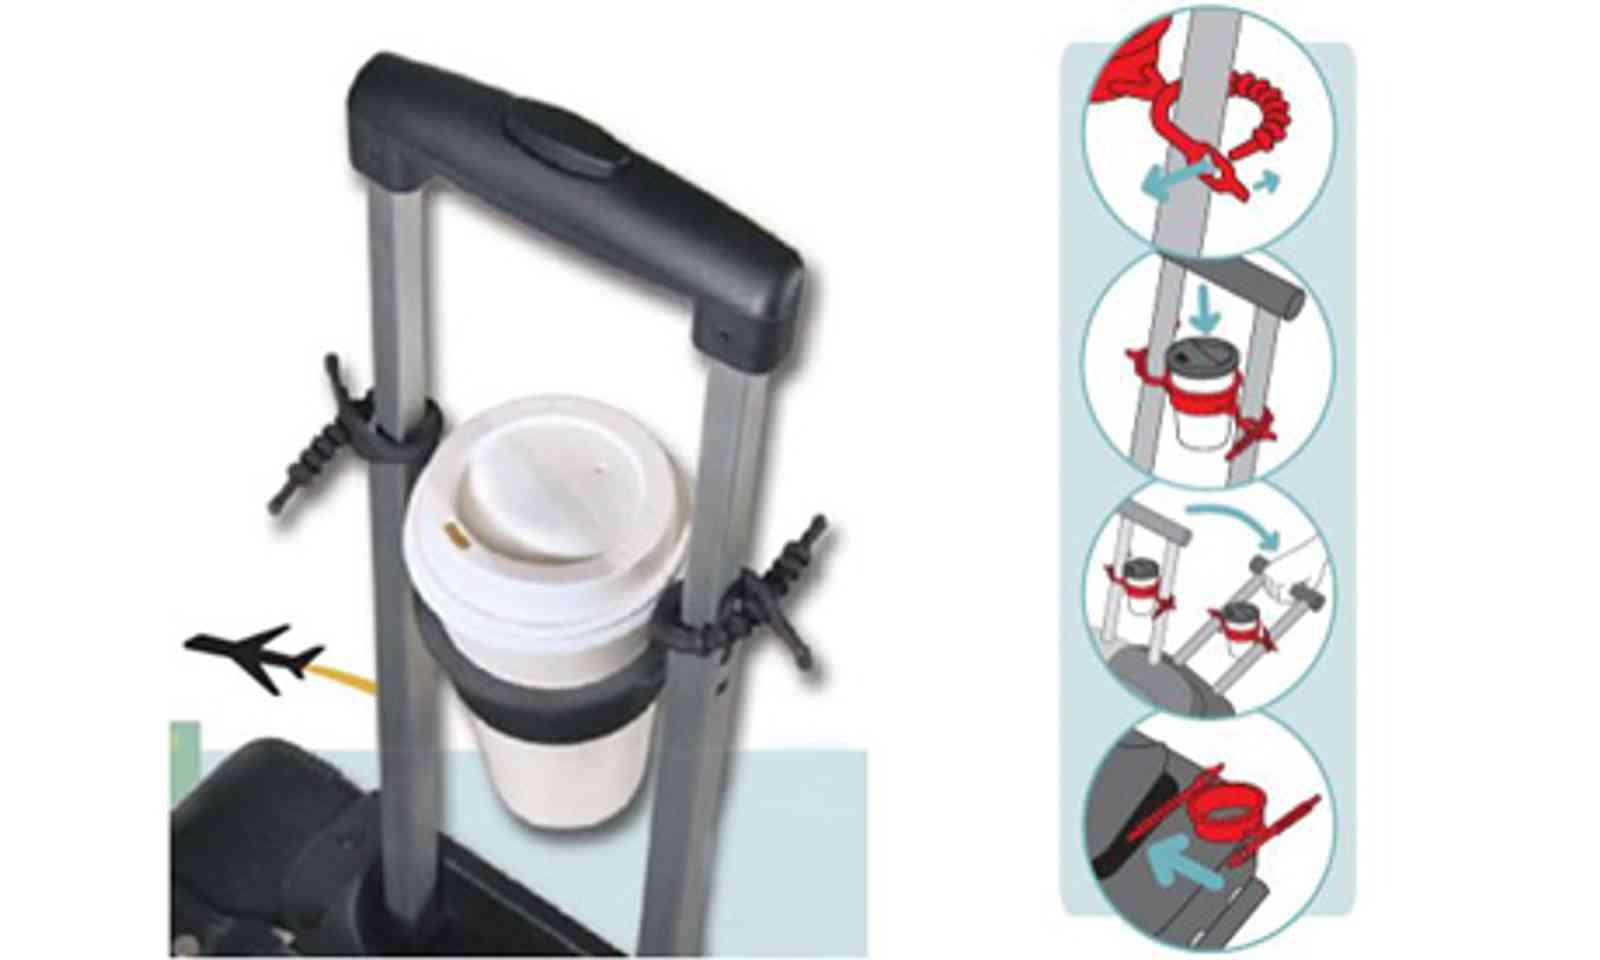 Tugo Luggage Cup Holder